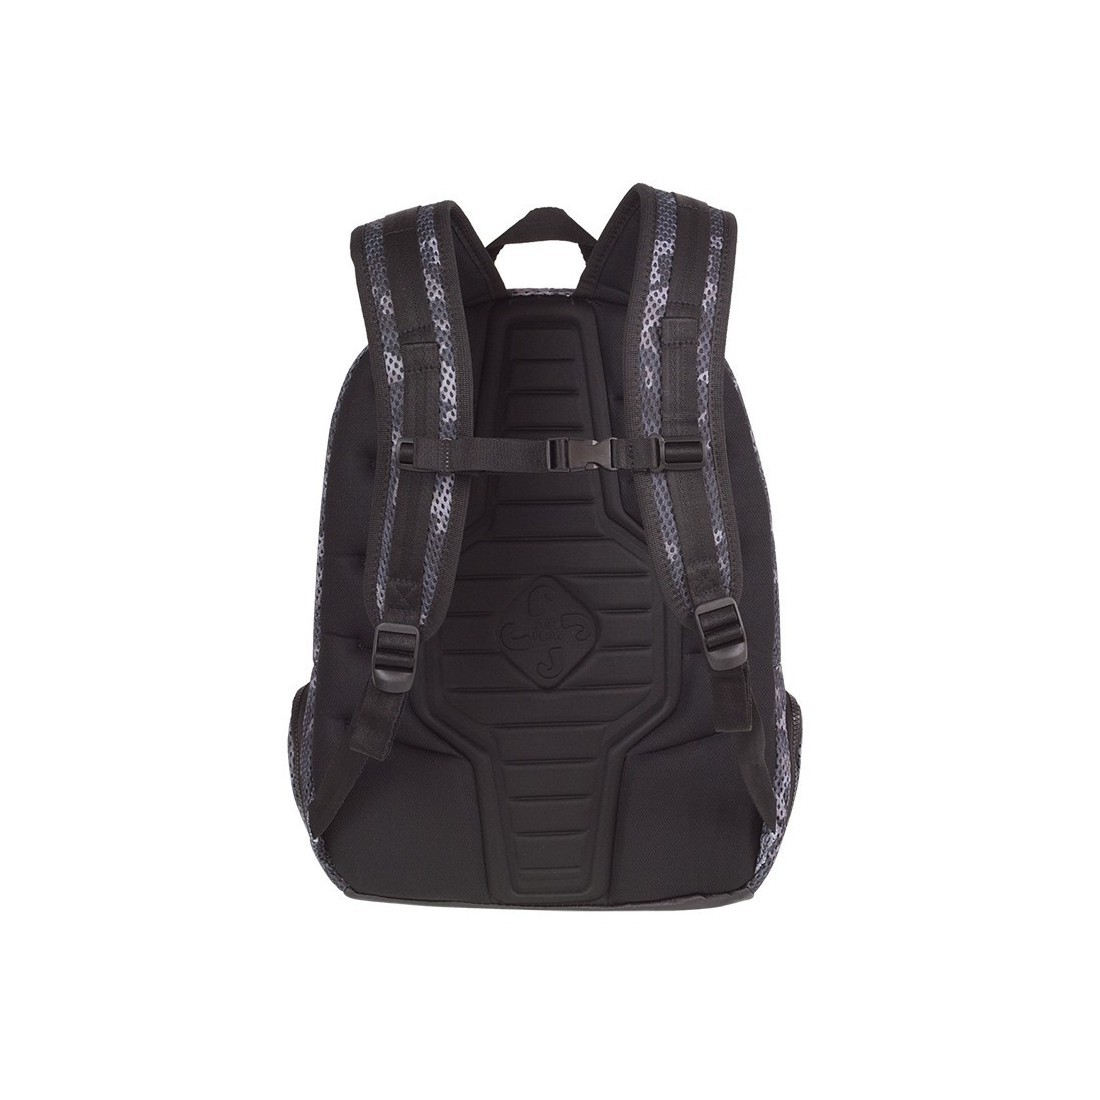 Plecak sportowy moro czarno-szary siatka CoolPack CP IMPACT II CAMO MESH BLACK - A550